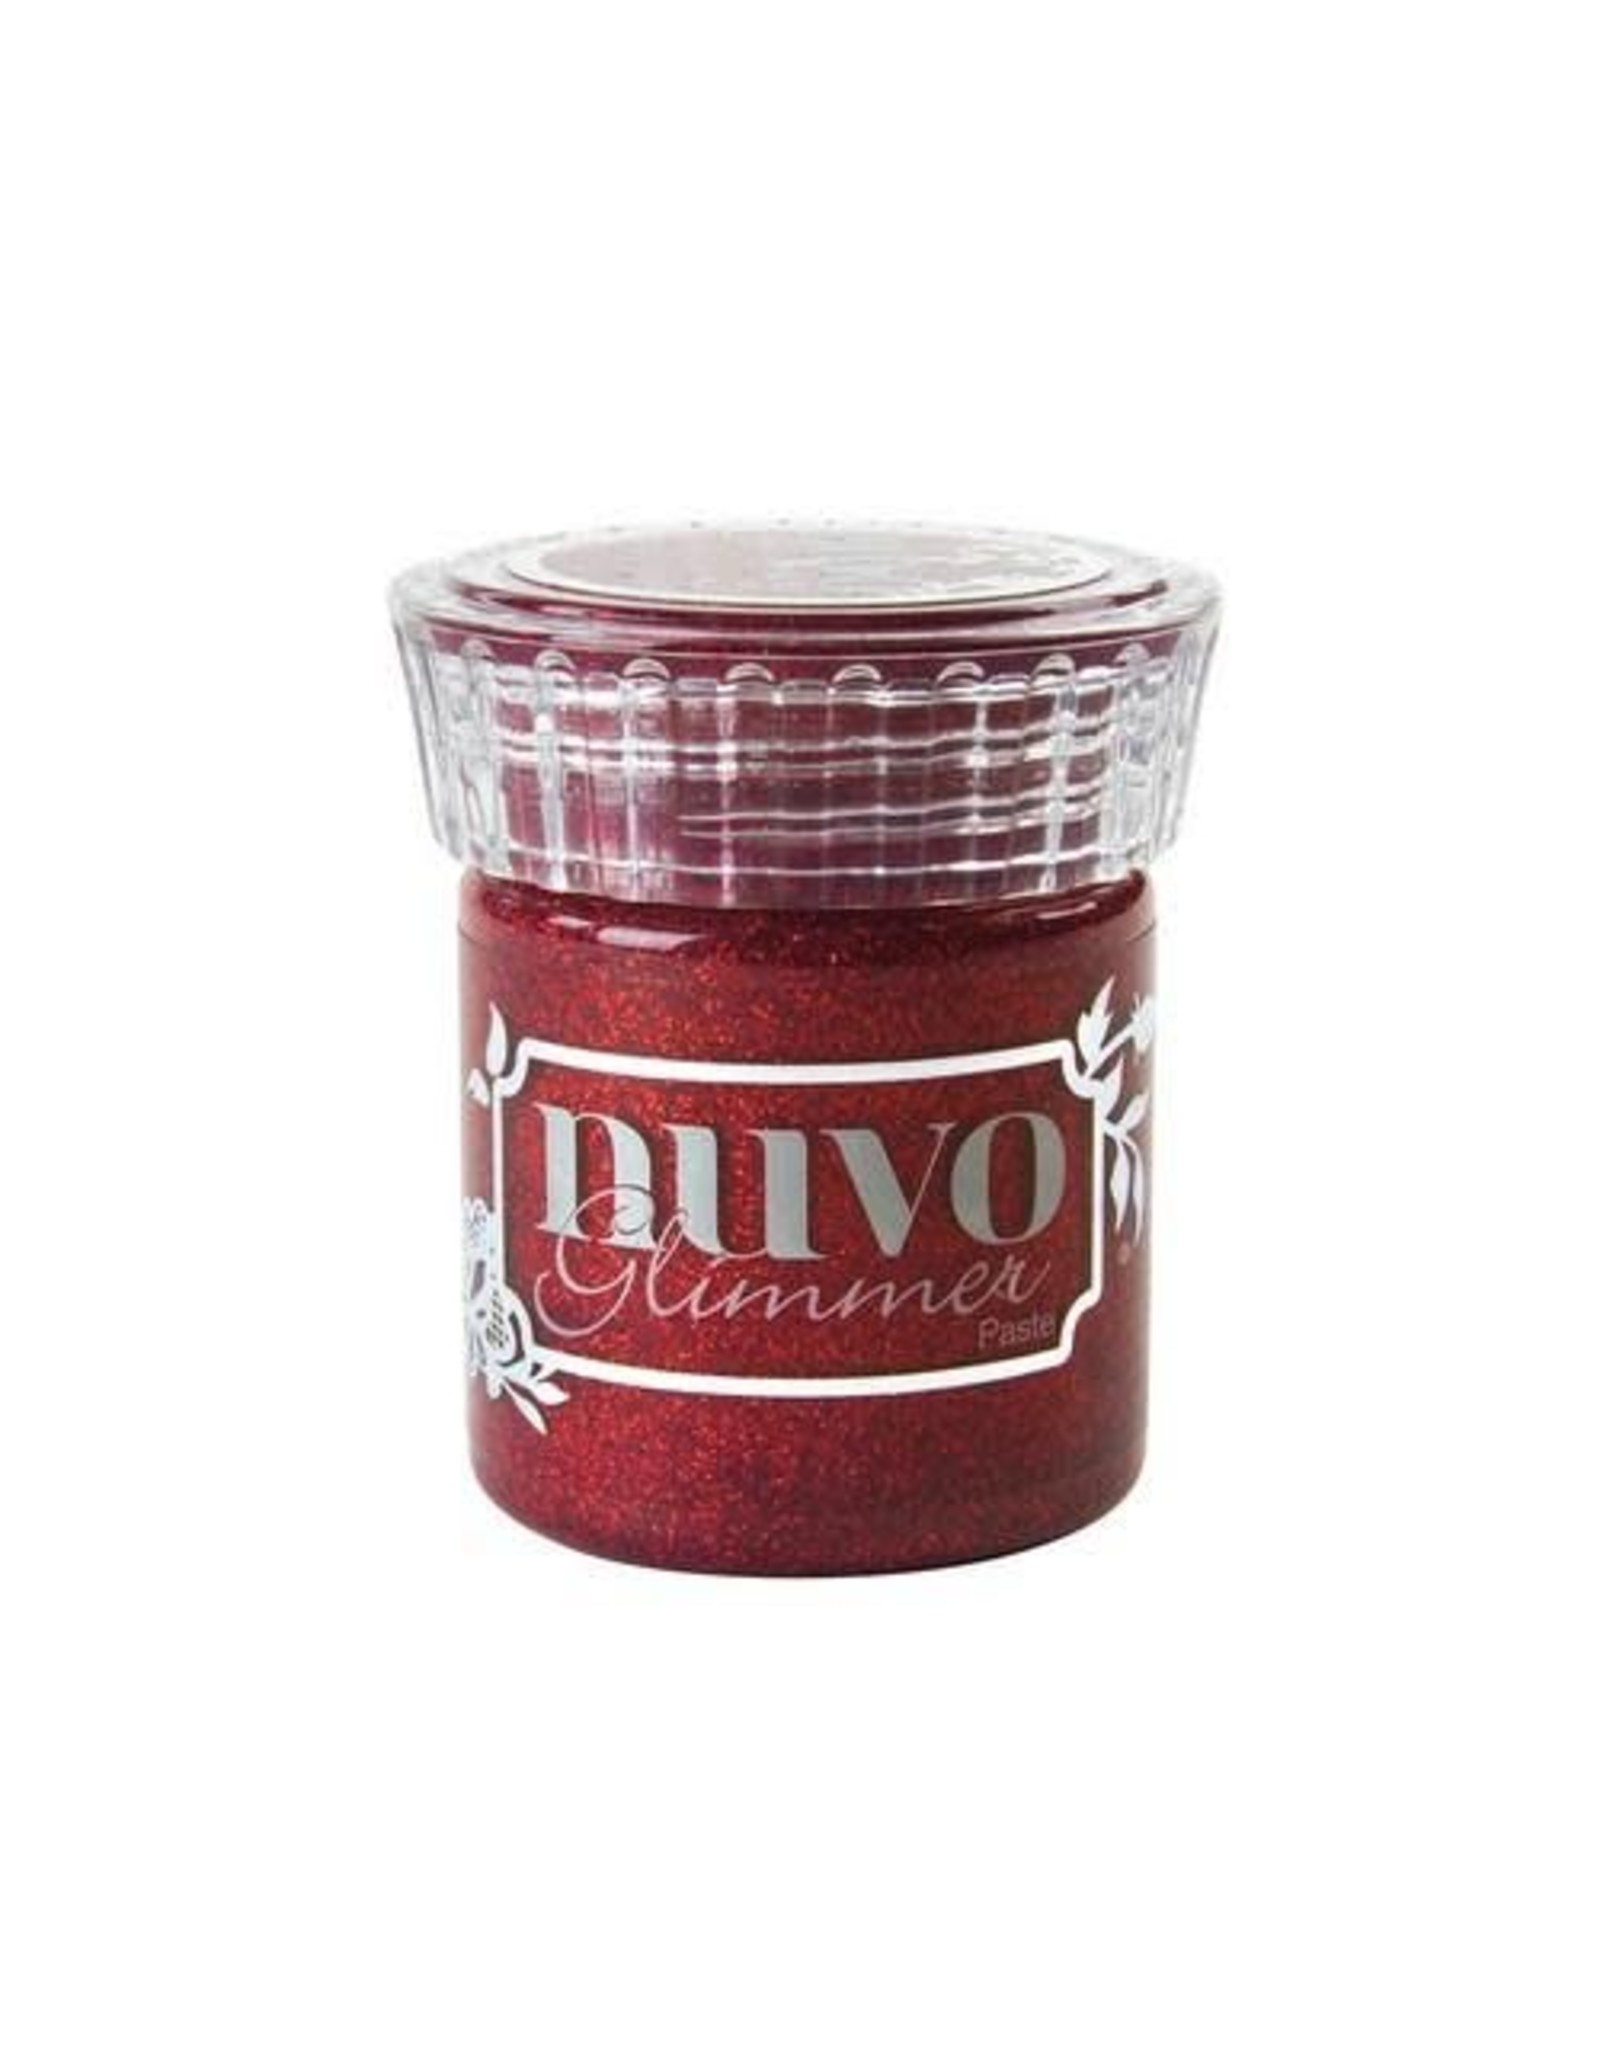 Nuvo Glitter Nuvo glimmer paste - garnet red 954N